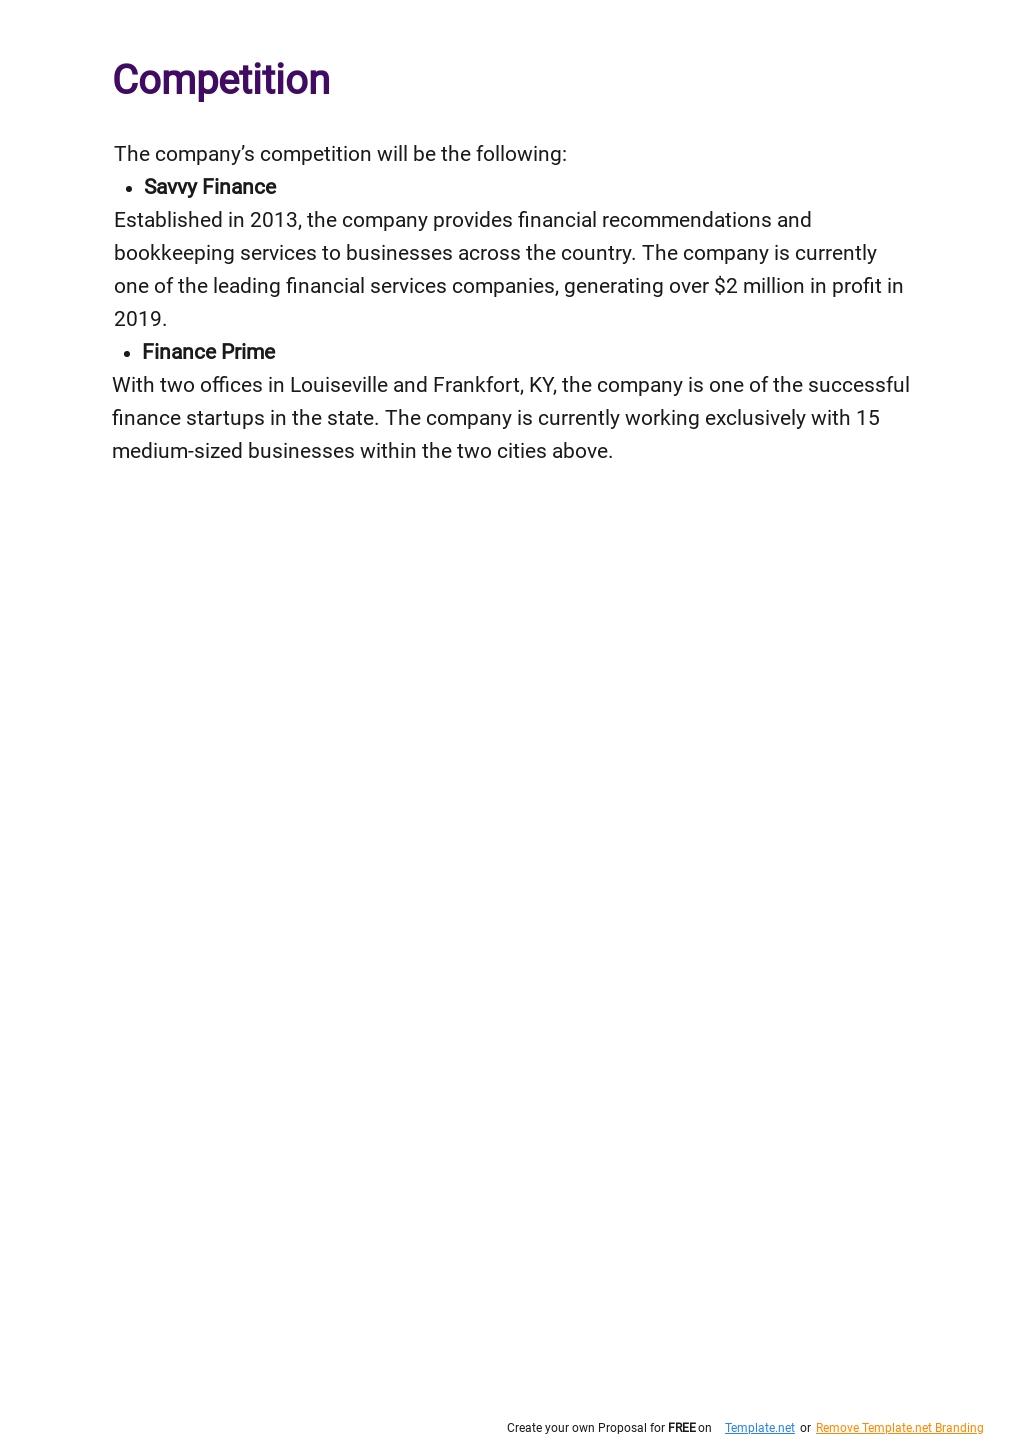 Strategic Business Plan Template 3.jpe